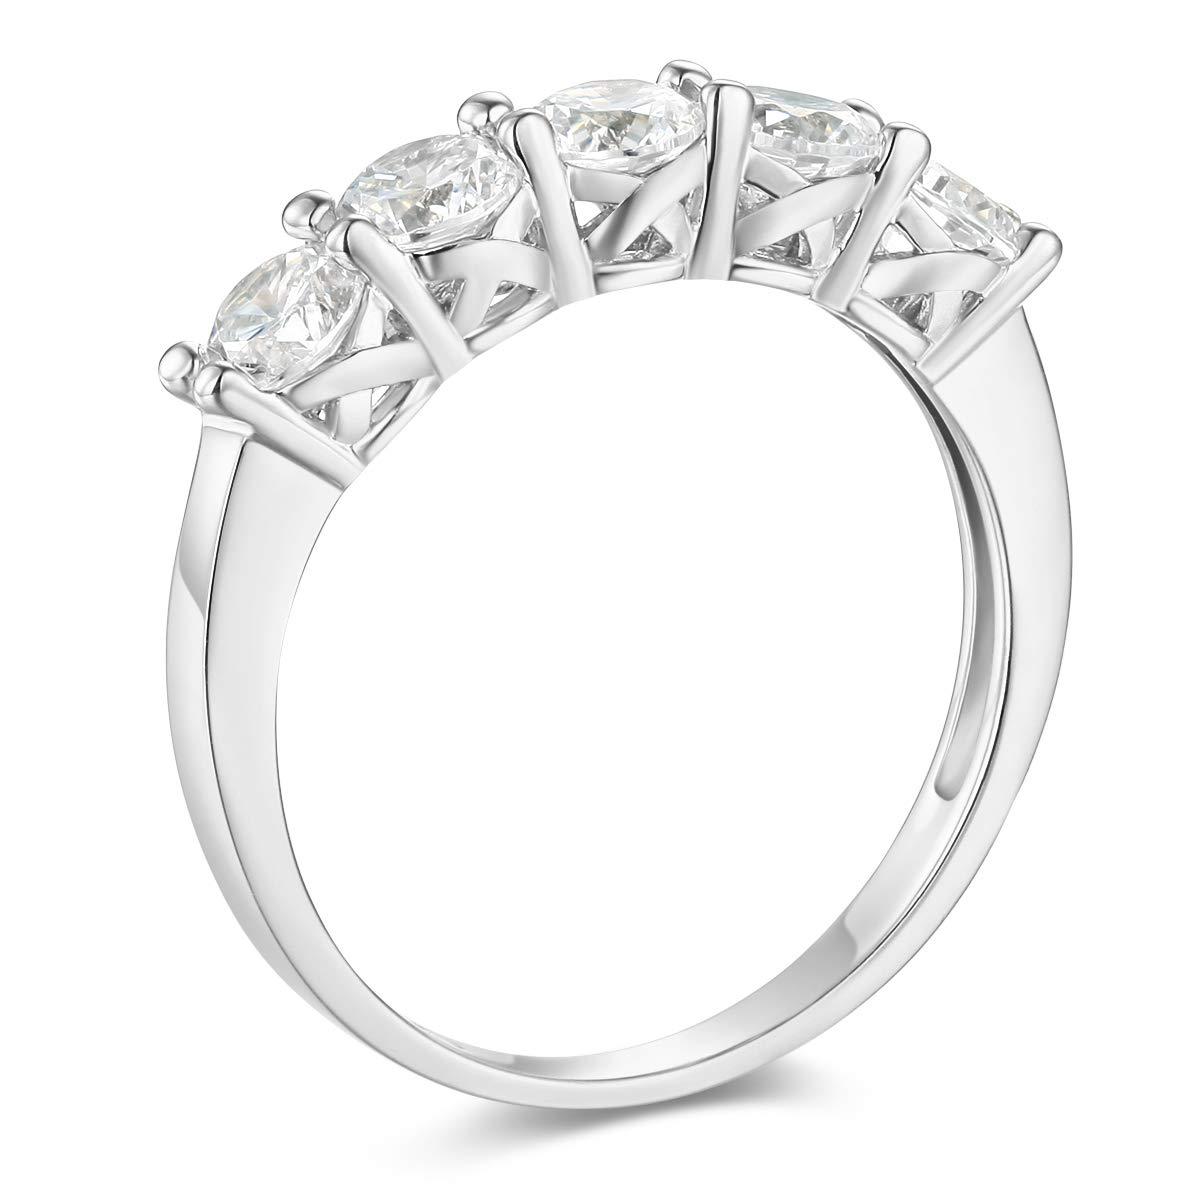 Wellingsale Ladies 925 Sterling Silver Polished Rhodium Wedding Band